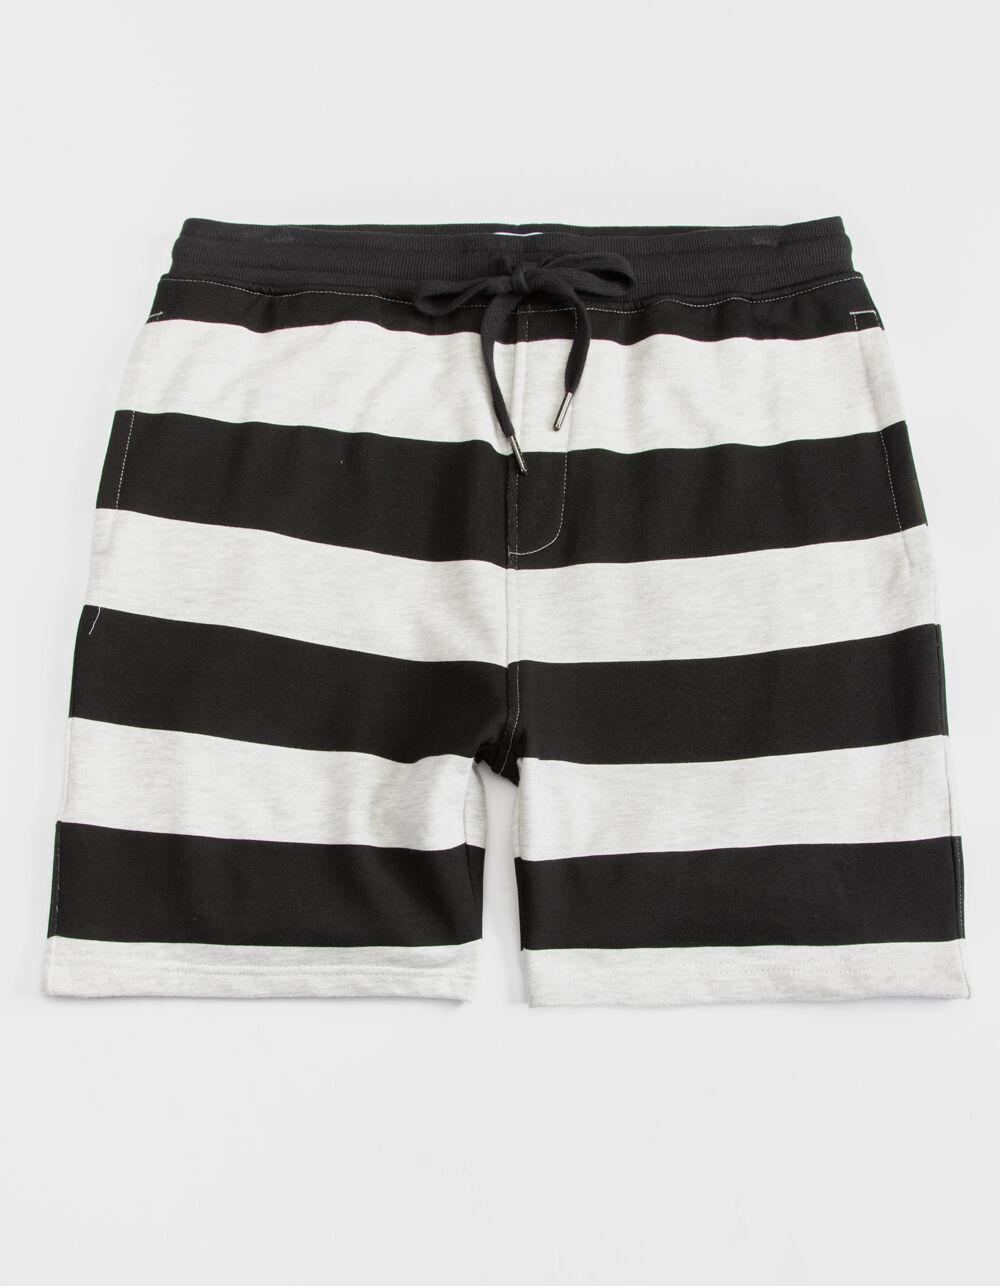 Image of CYA DENVER STRIPE BLACK & WHITE SWEAT SHORTS